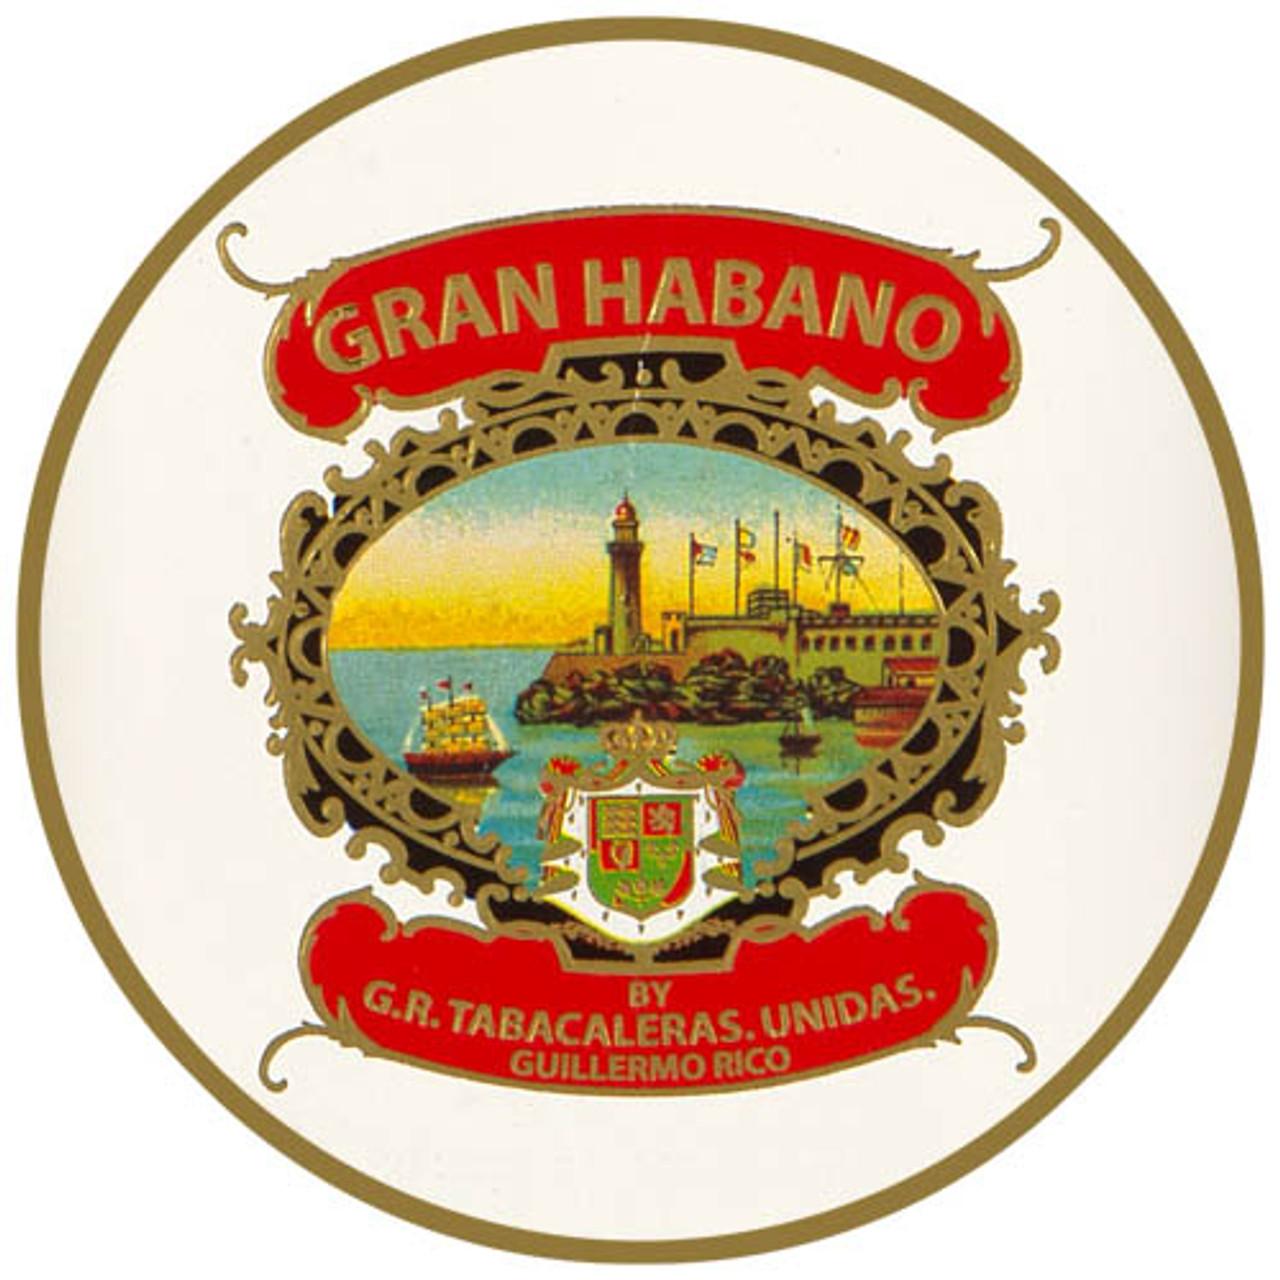 Gran Habano Gran Reserva #5 Grandioso 2010 Cigars - 7 x 70 (Box of 20)